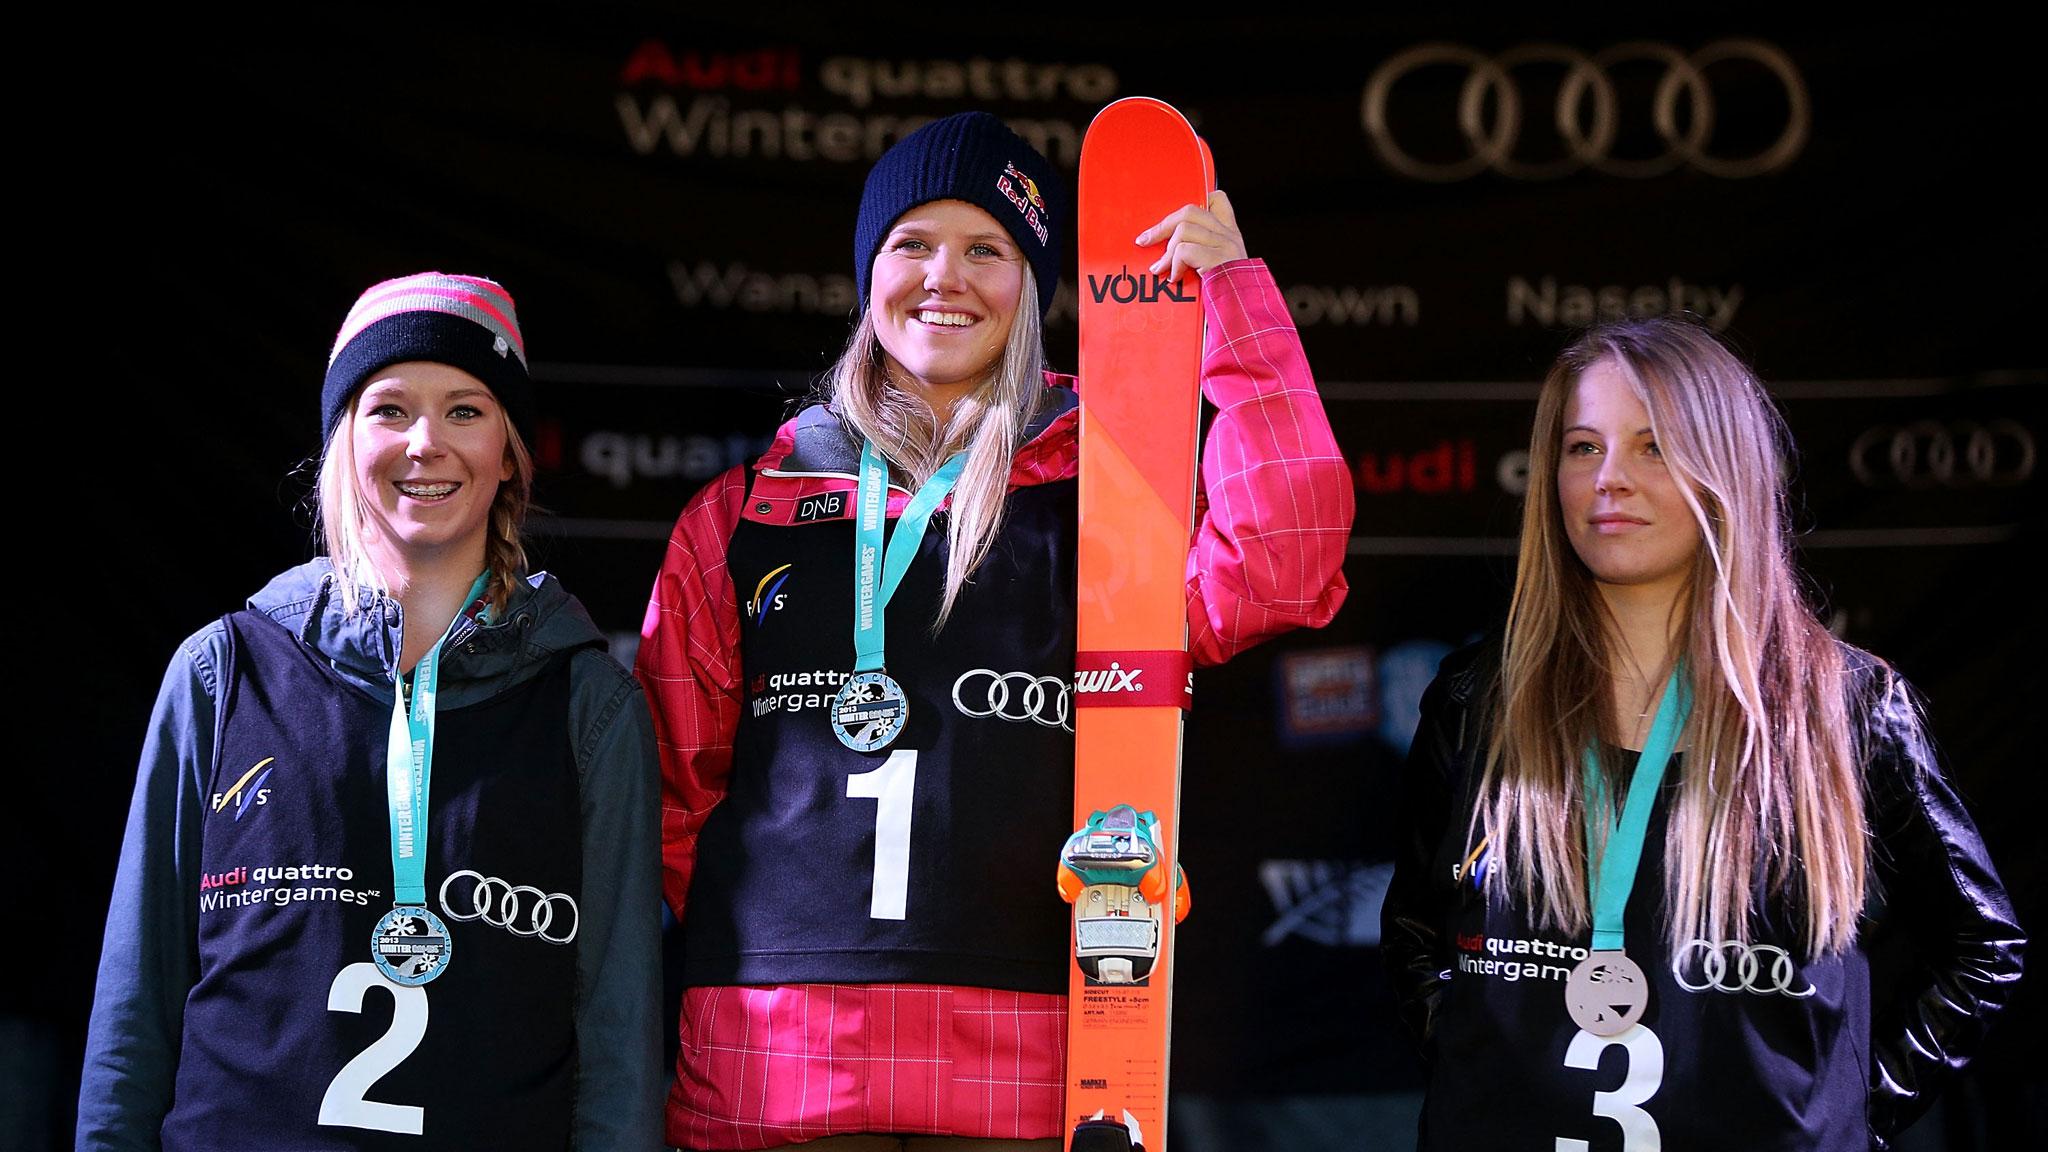 The women's ski slopestyle podium, from left: Dara Howell (second), Tiril Sjstad Christiansen (first), Lisa Zimmermann (third).